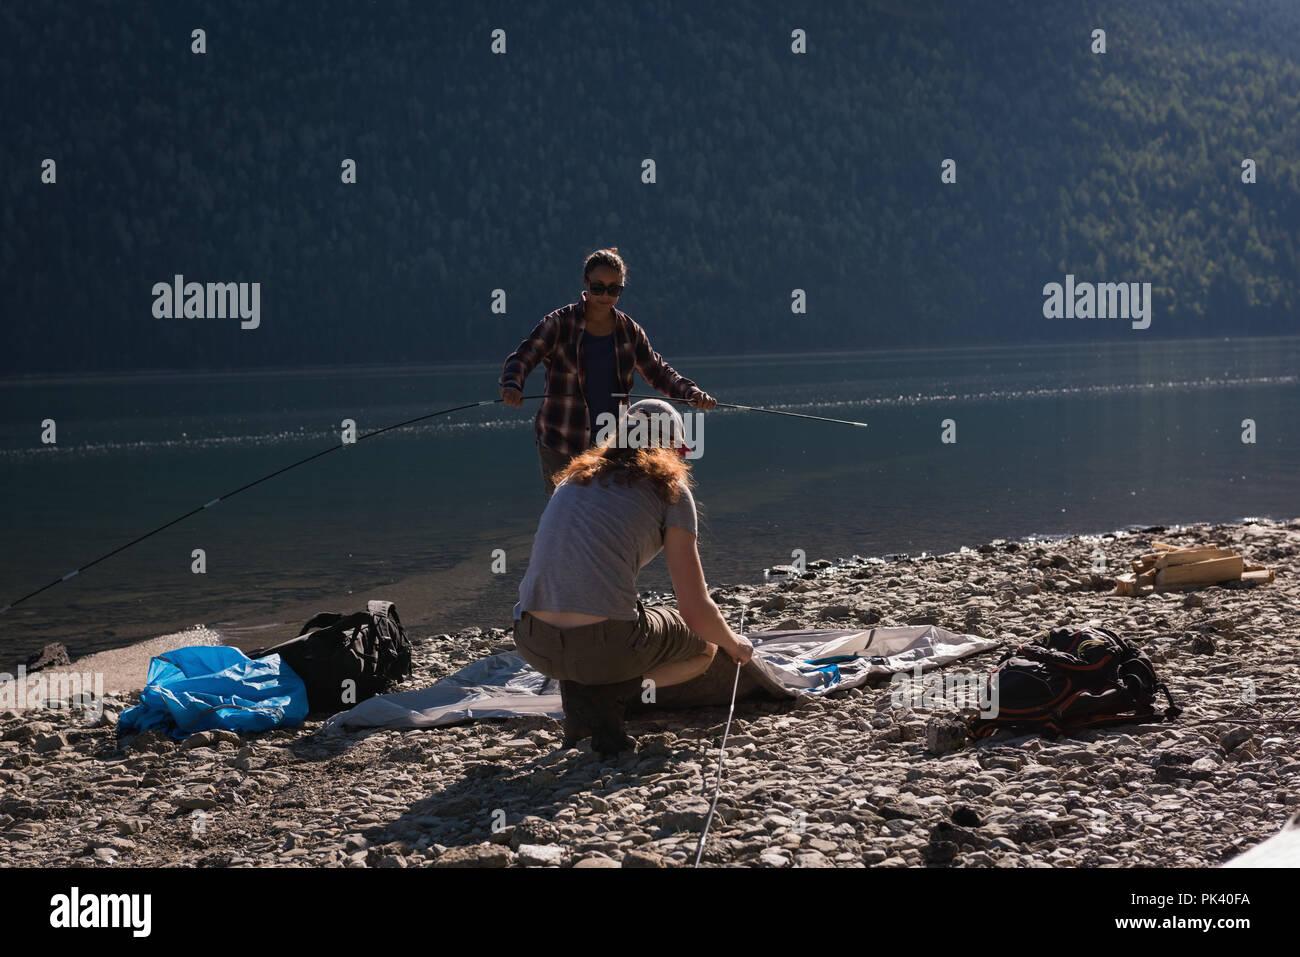 Couple setting up tent near riverside - Stock Image